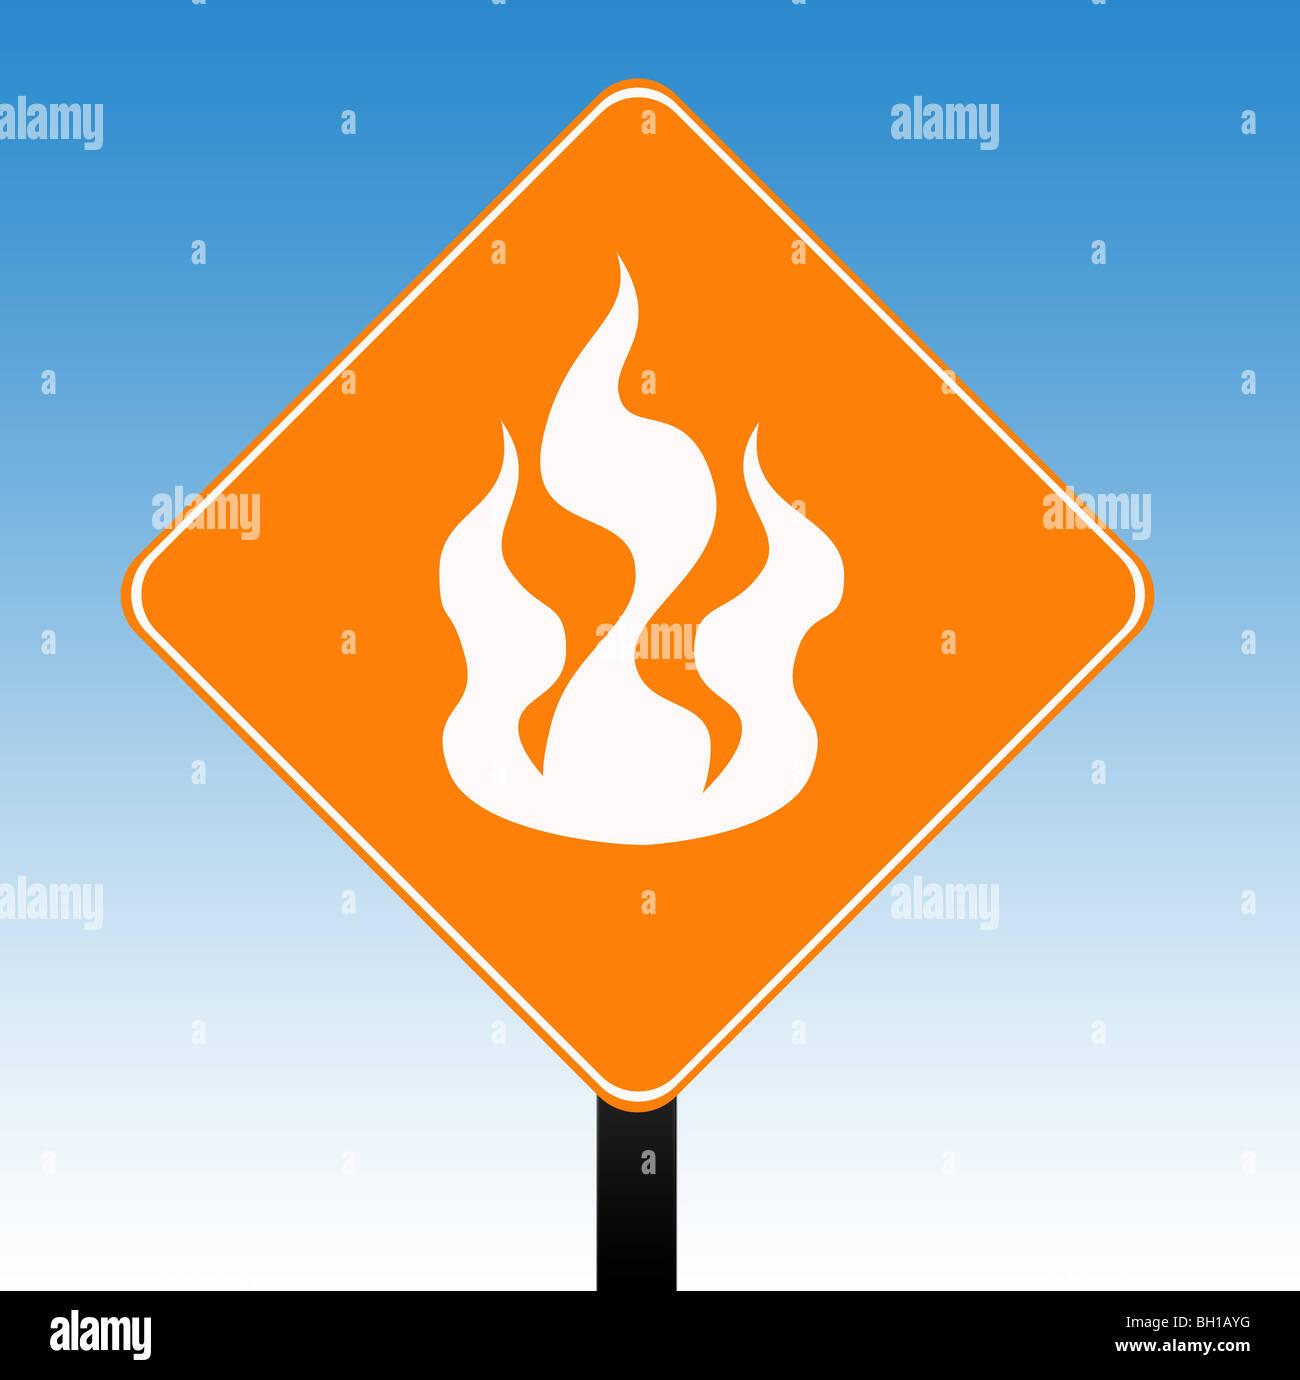 Fire Hazard Warning Sign Stock Photos Fire Hazard Warning Sign